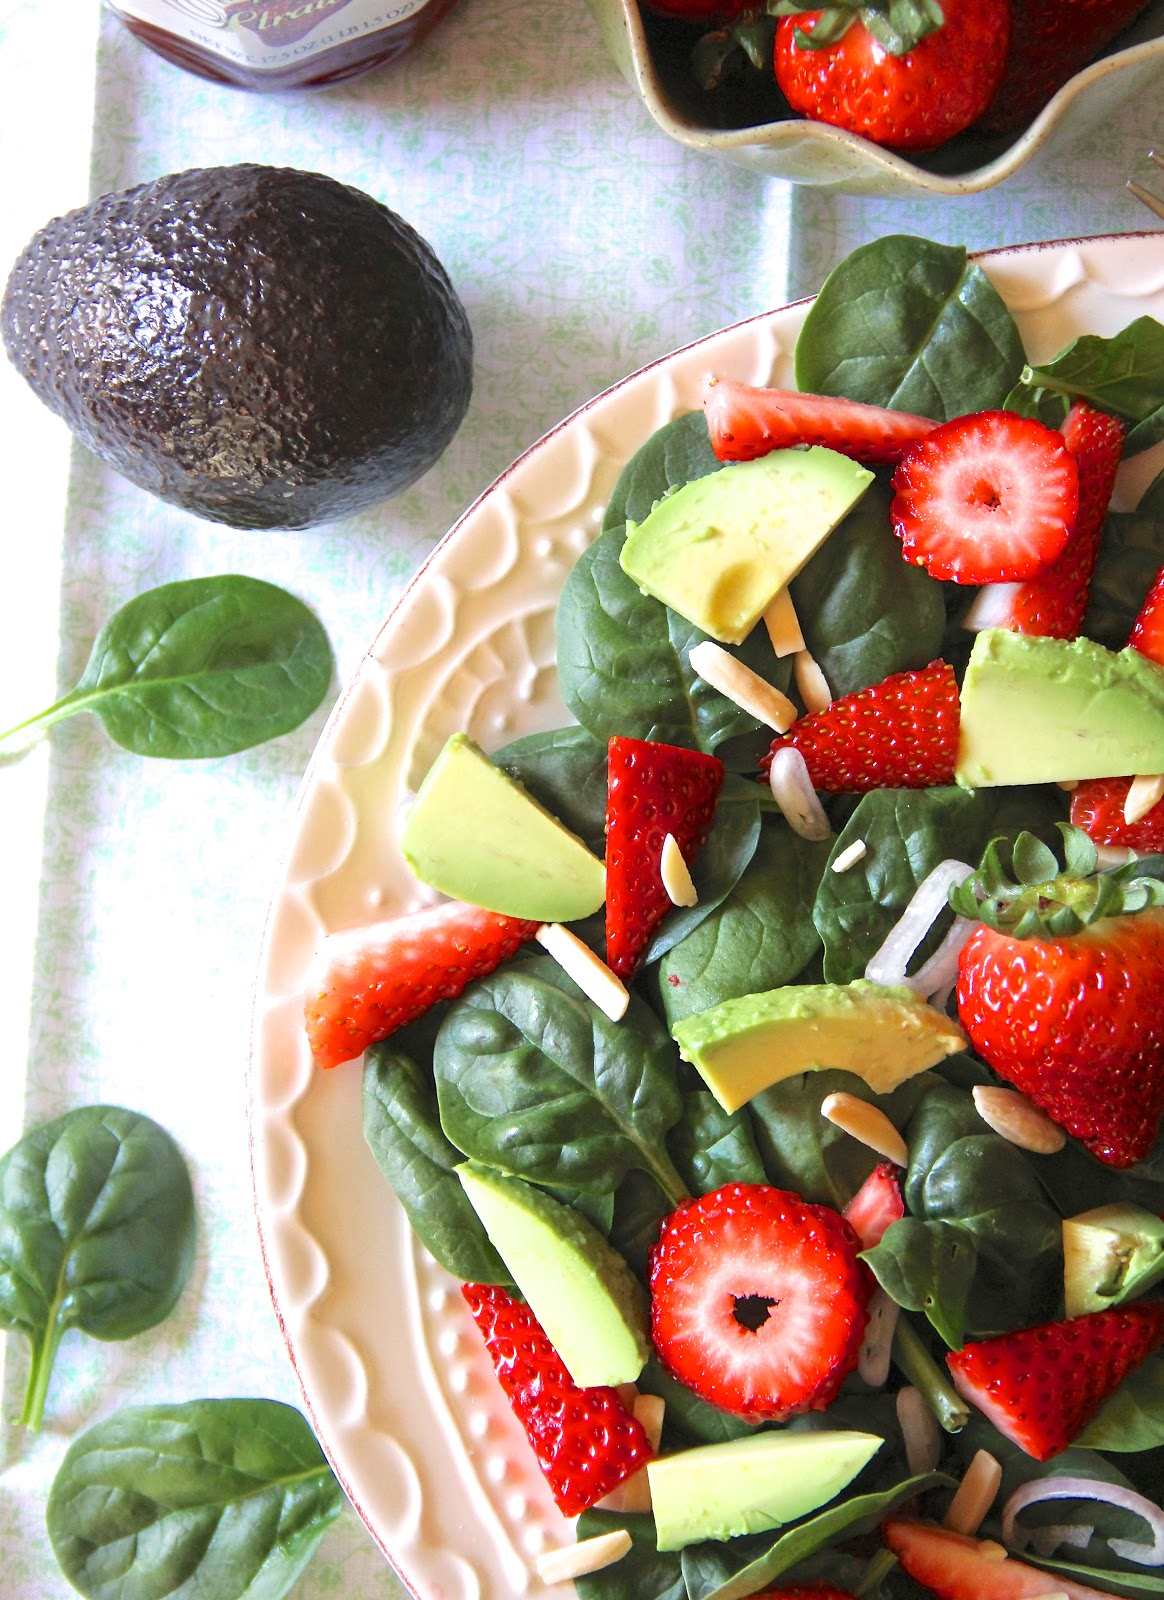 ValSoCal: Strawberry Avocado Salad